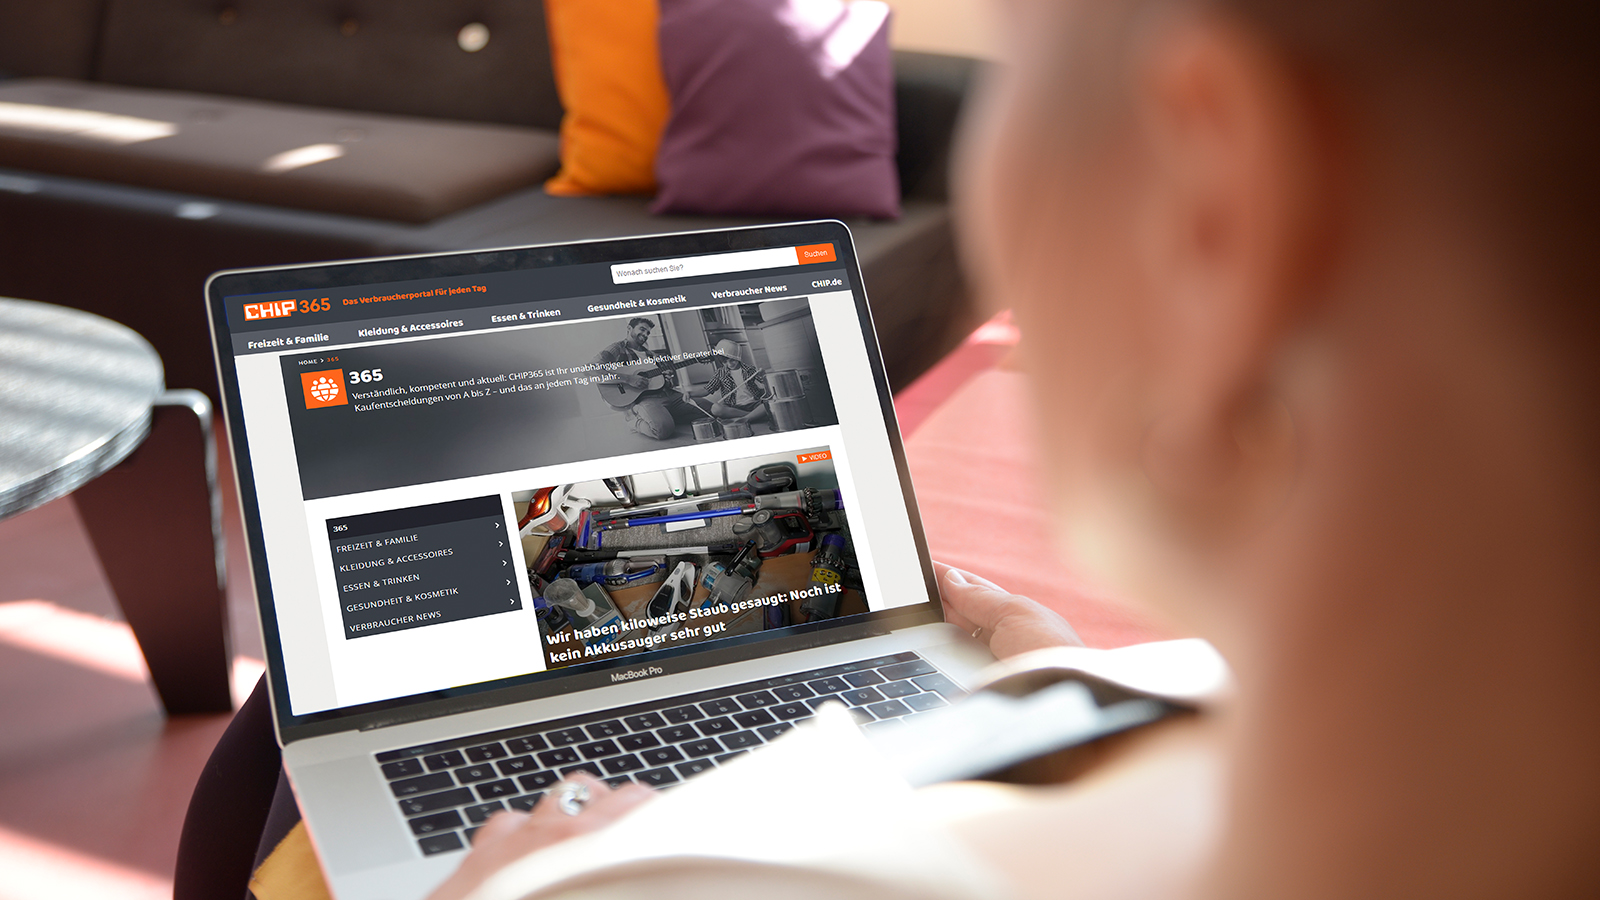 CHIP 365: Deutschlands größtes Technik-Portal expandiert